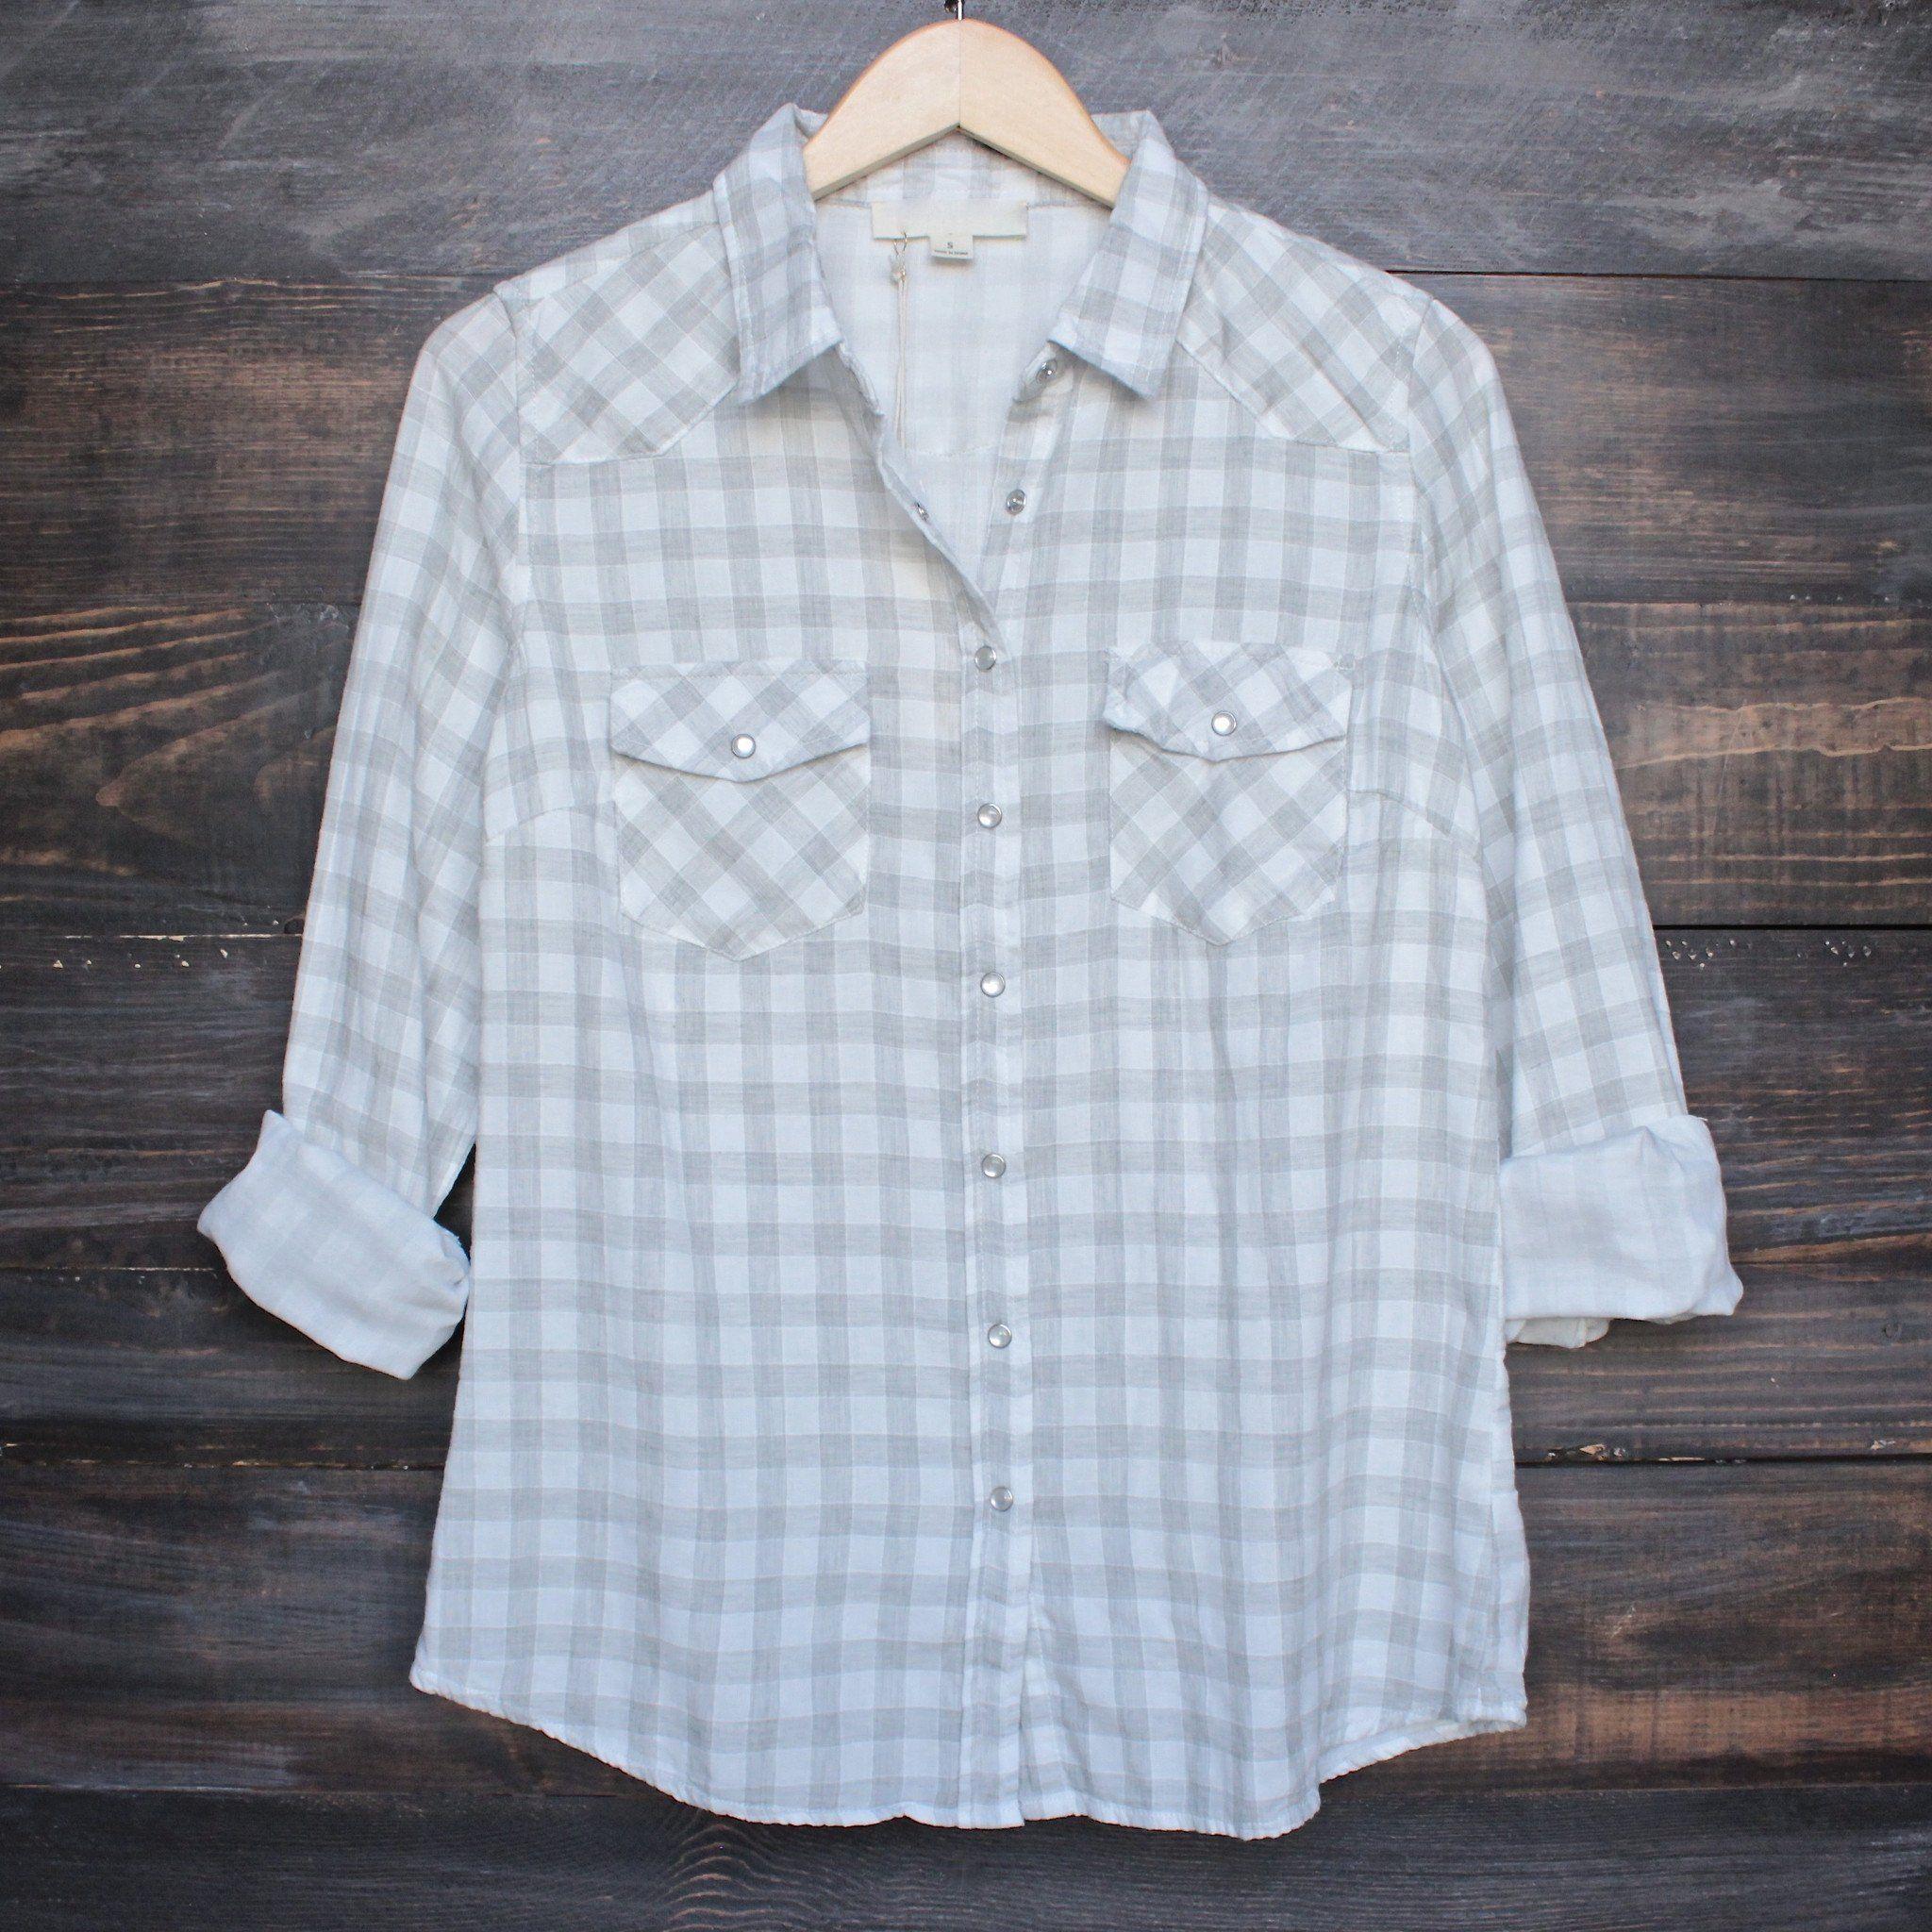 Flannel shirt vintage  Vintage affair soft button up womens plaid flannel long sleeve shirt